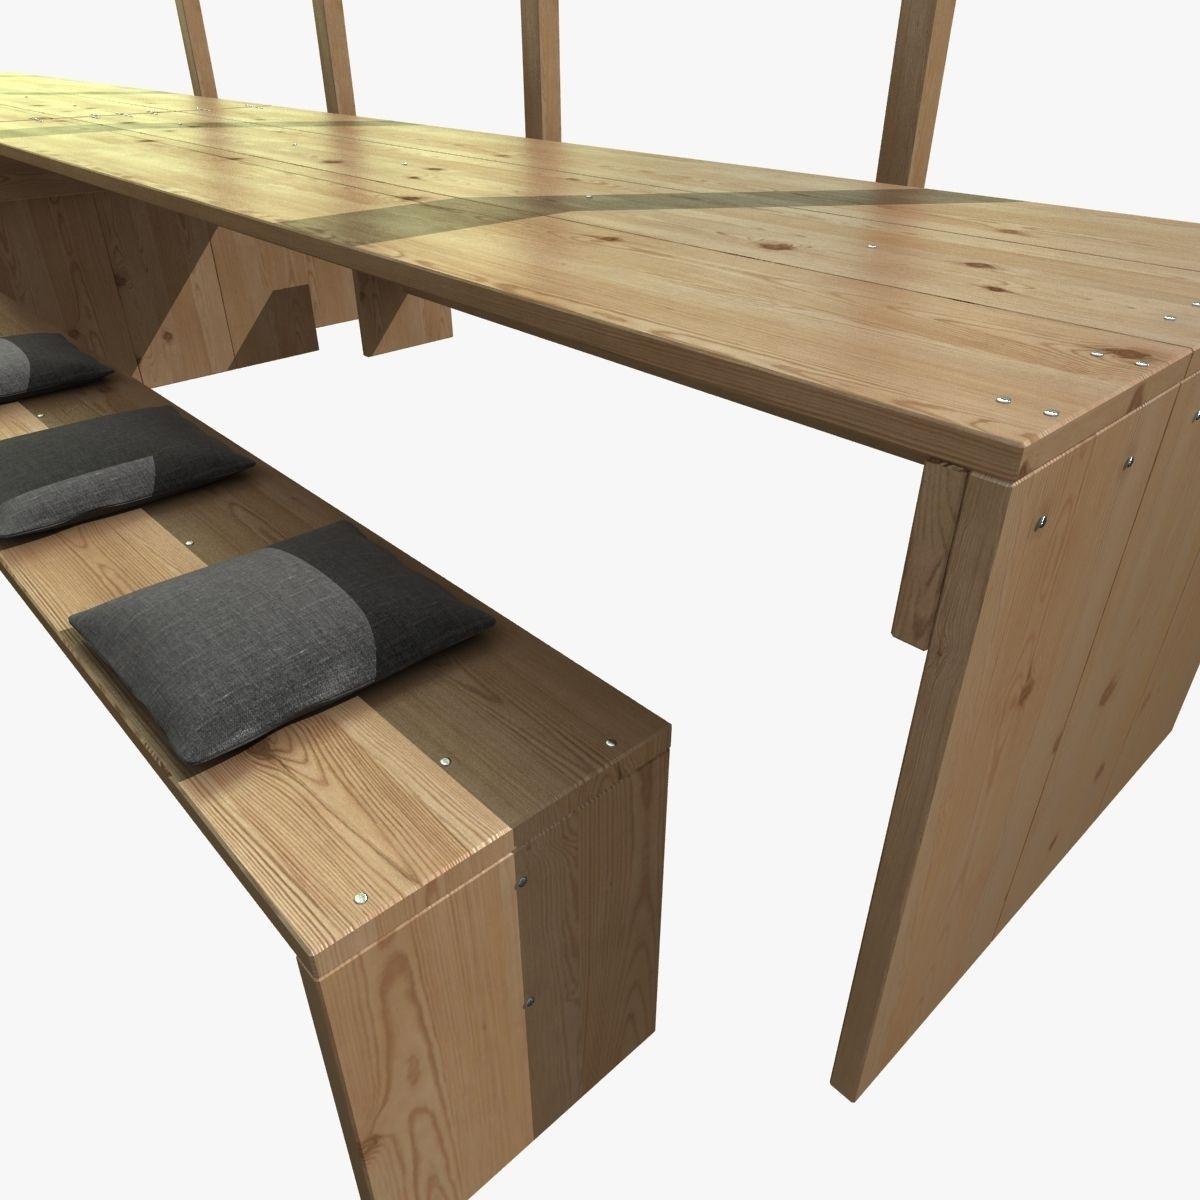 ... Pergola With Wooden Table Bench Lights 3d Model Max Obj 3ds Fbx Mtl 5  ...